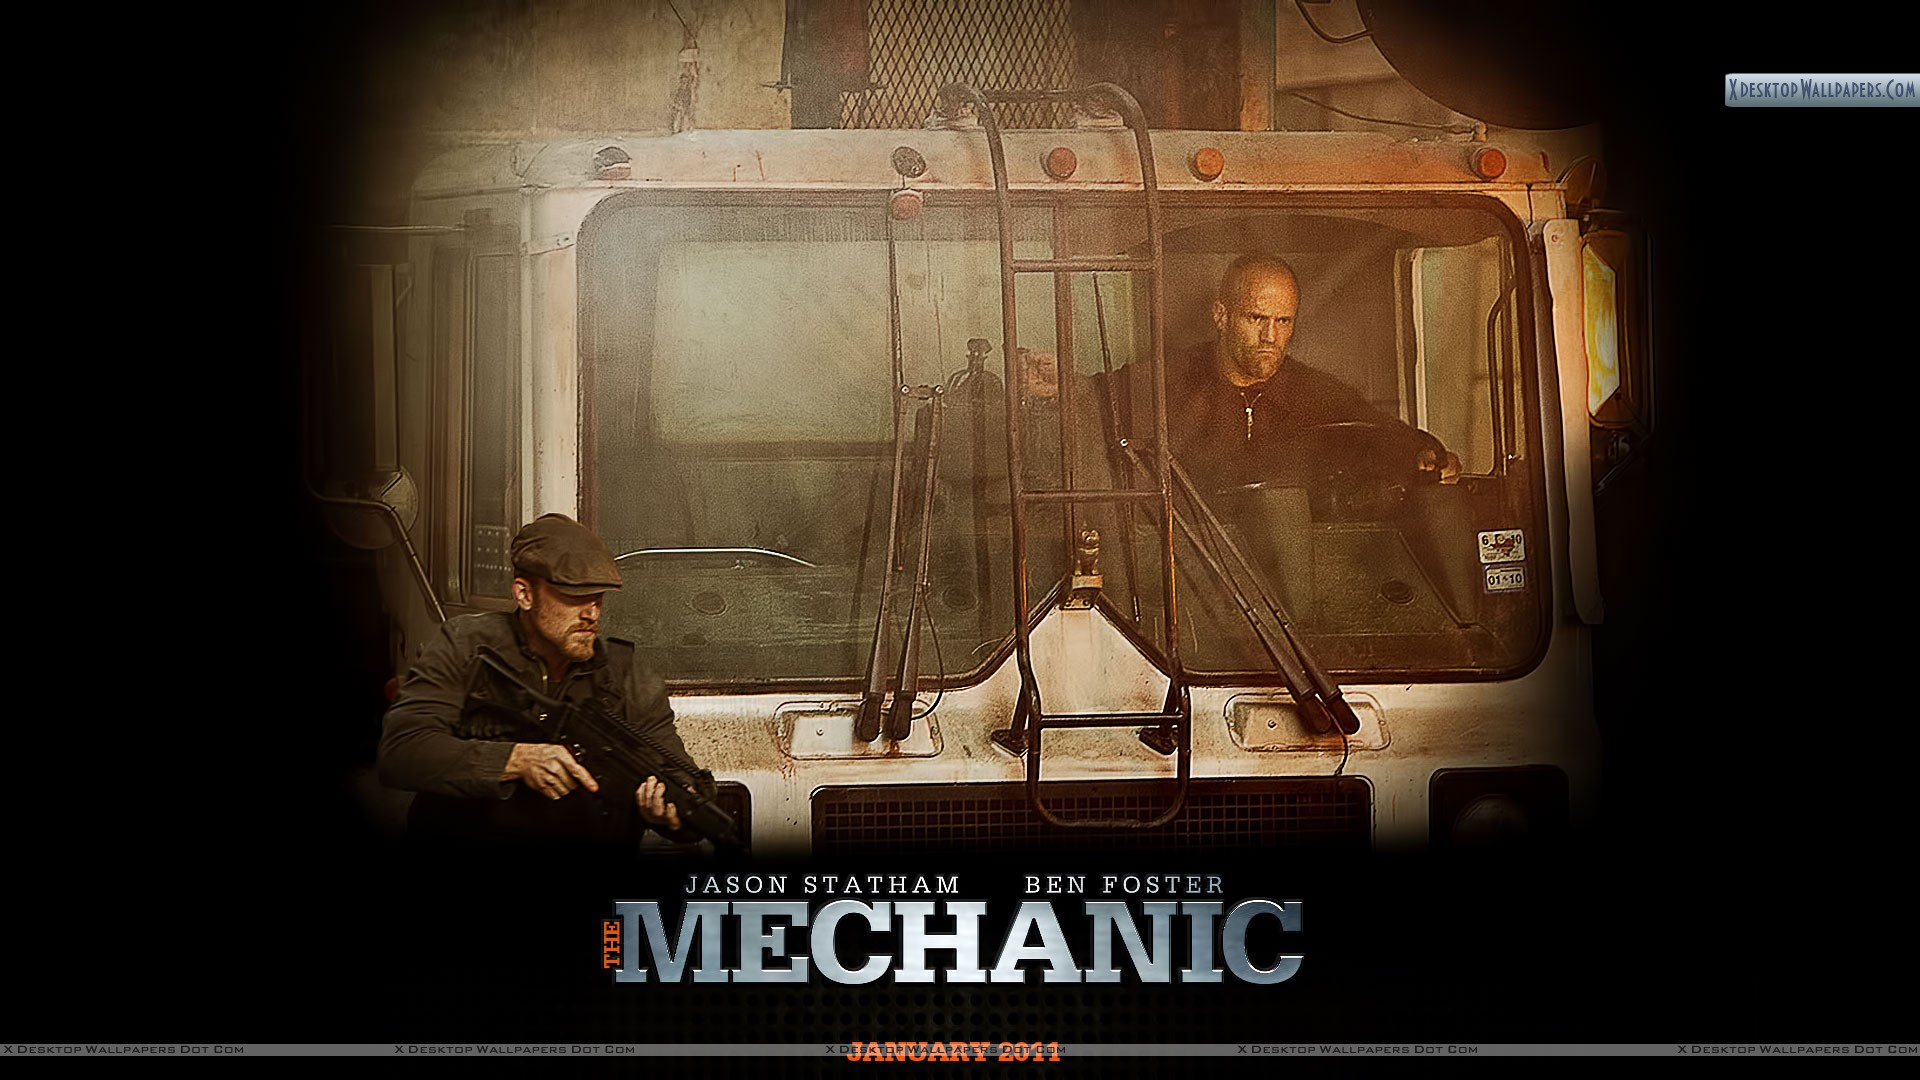 Jason Statham Driving Truck HD Wallpaper